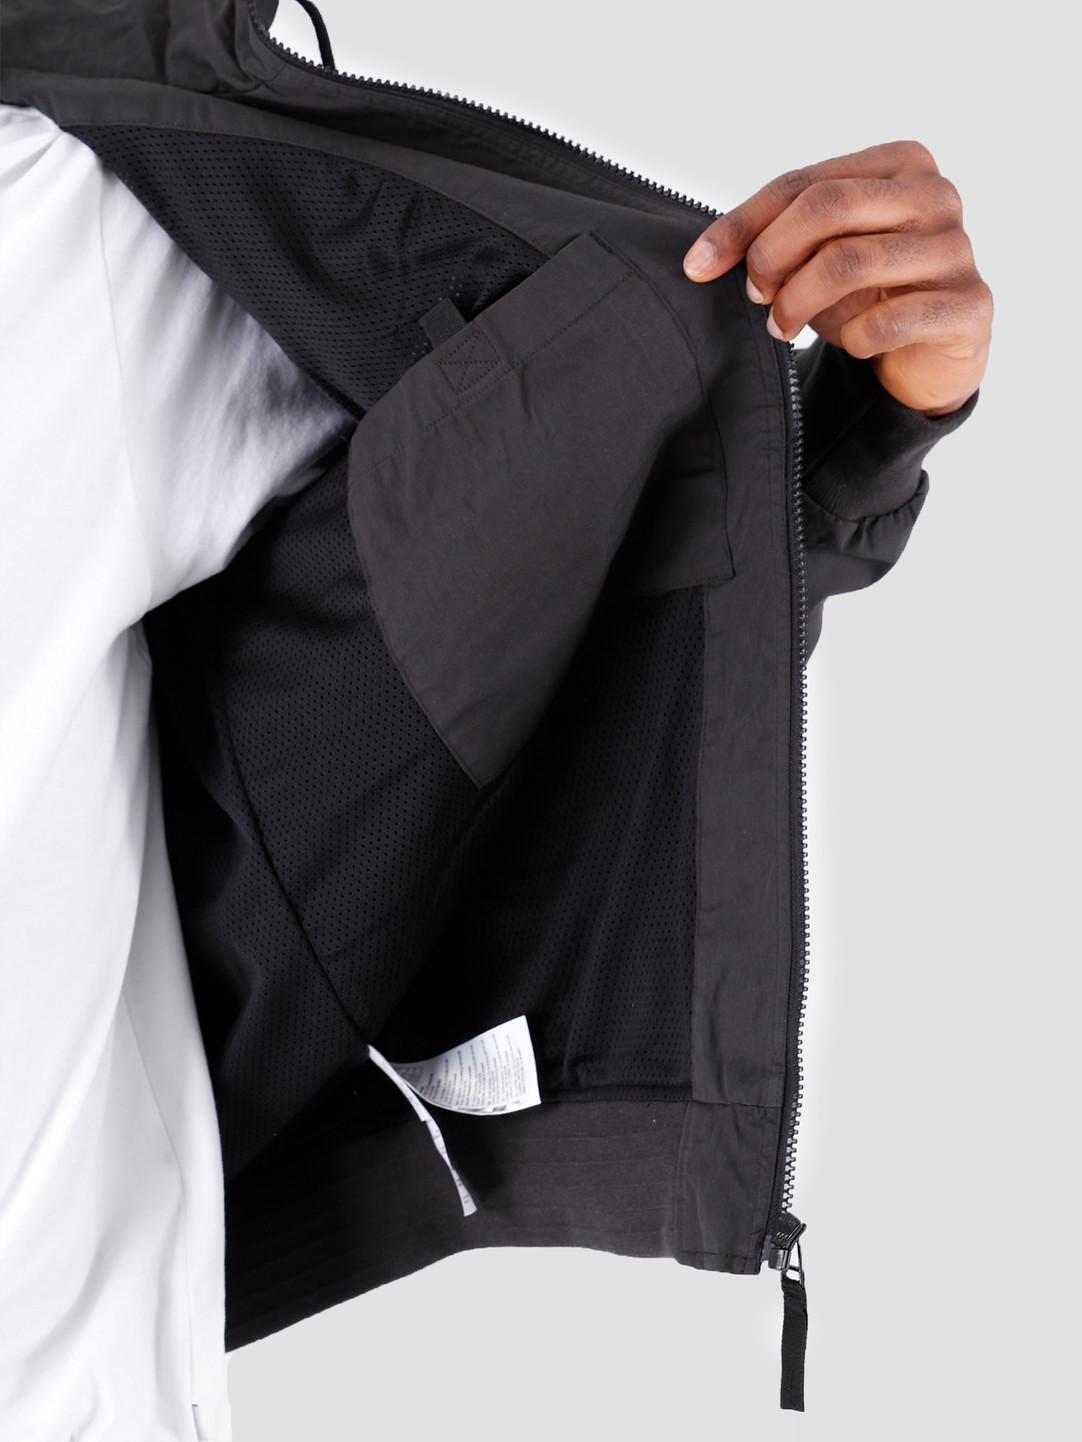 Carhartt WIP Carhartt WIP Marsh Jacket Black White I027797-8900